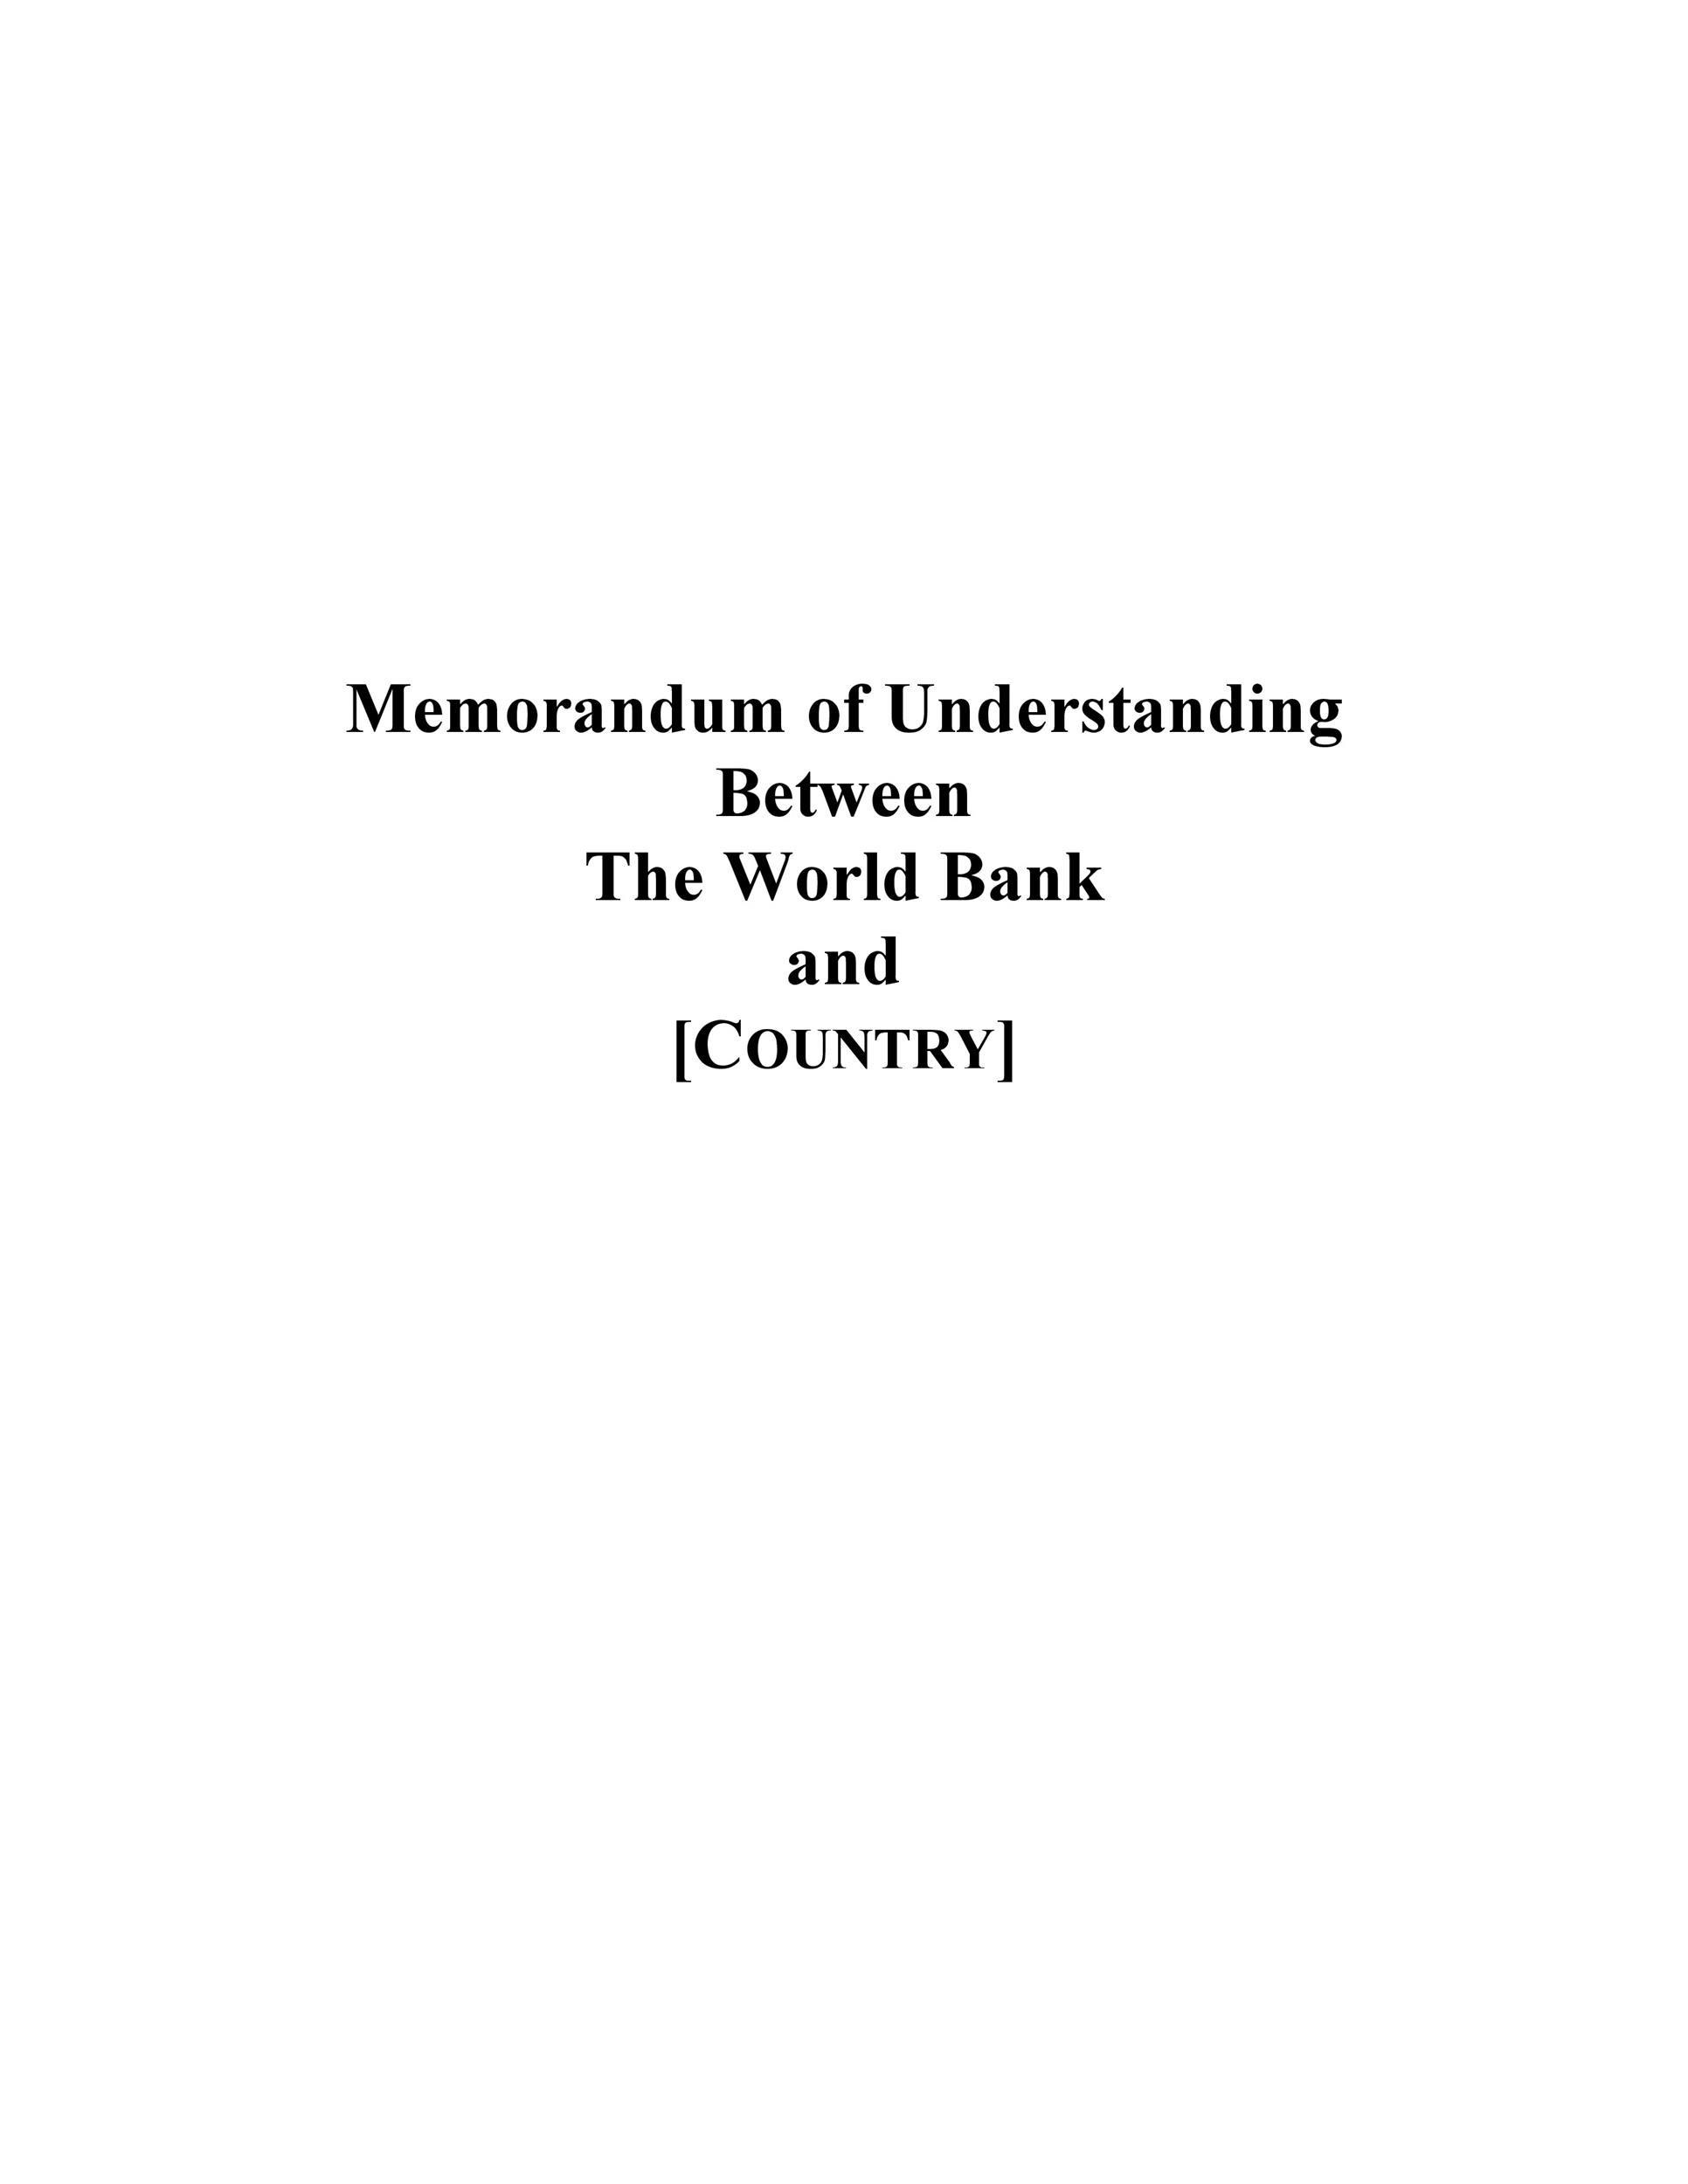 50 Free Memorandum of Understanding Templates Word ᐅ Template Lab